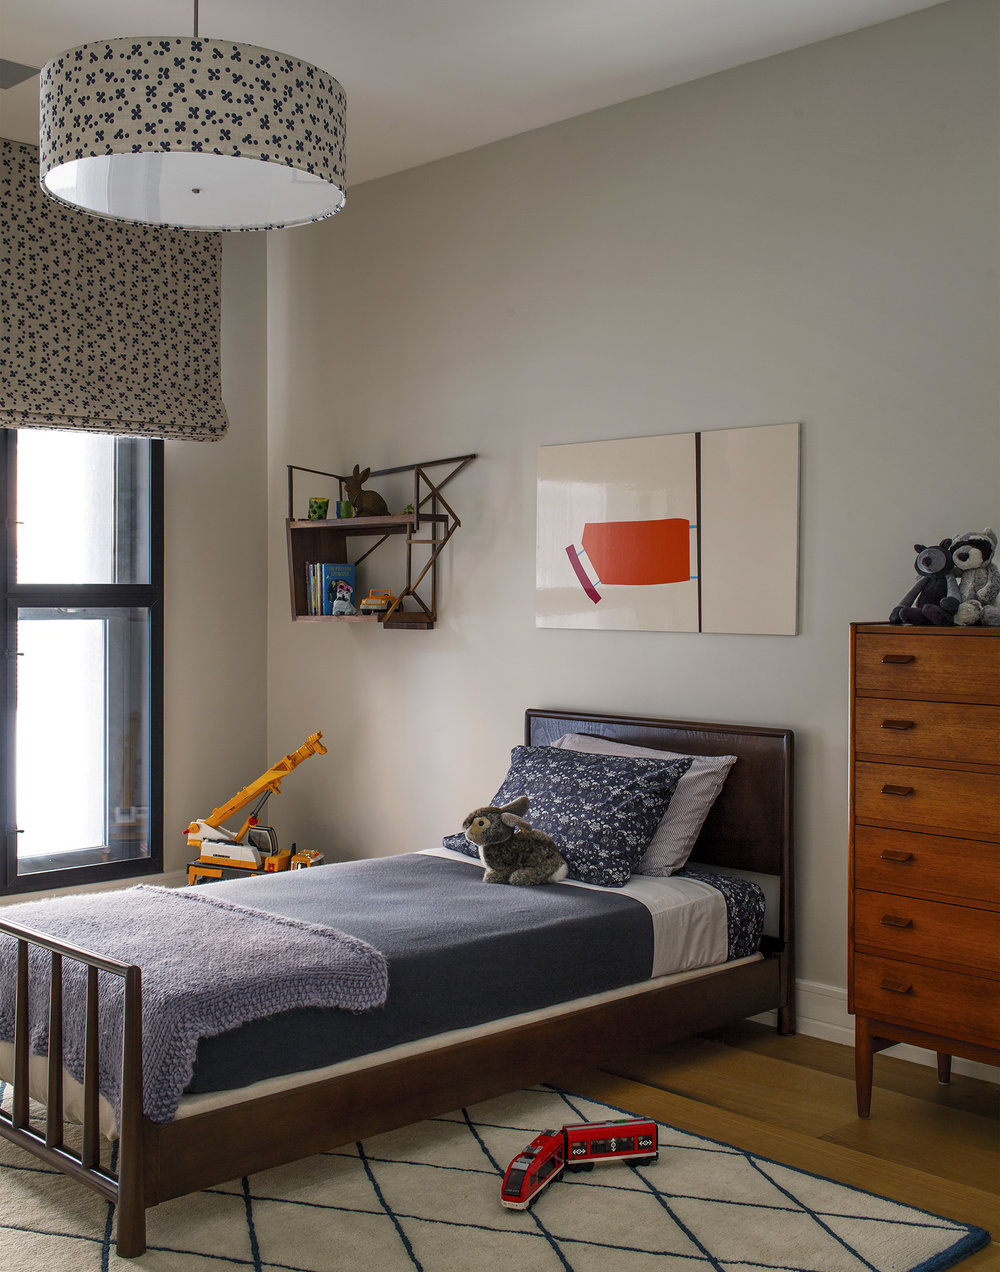 19-Kids Bedroom.jpg